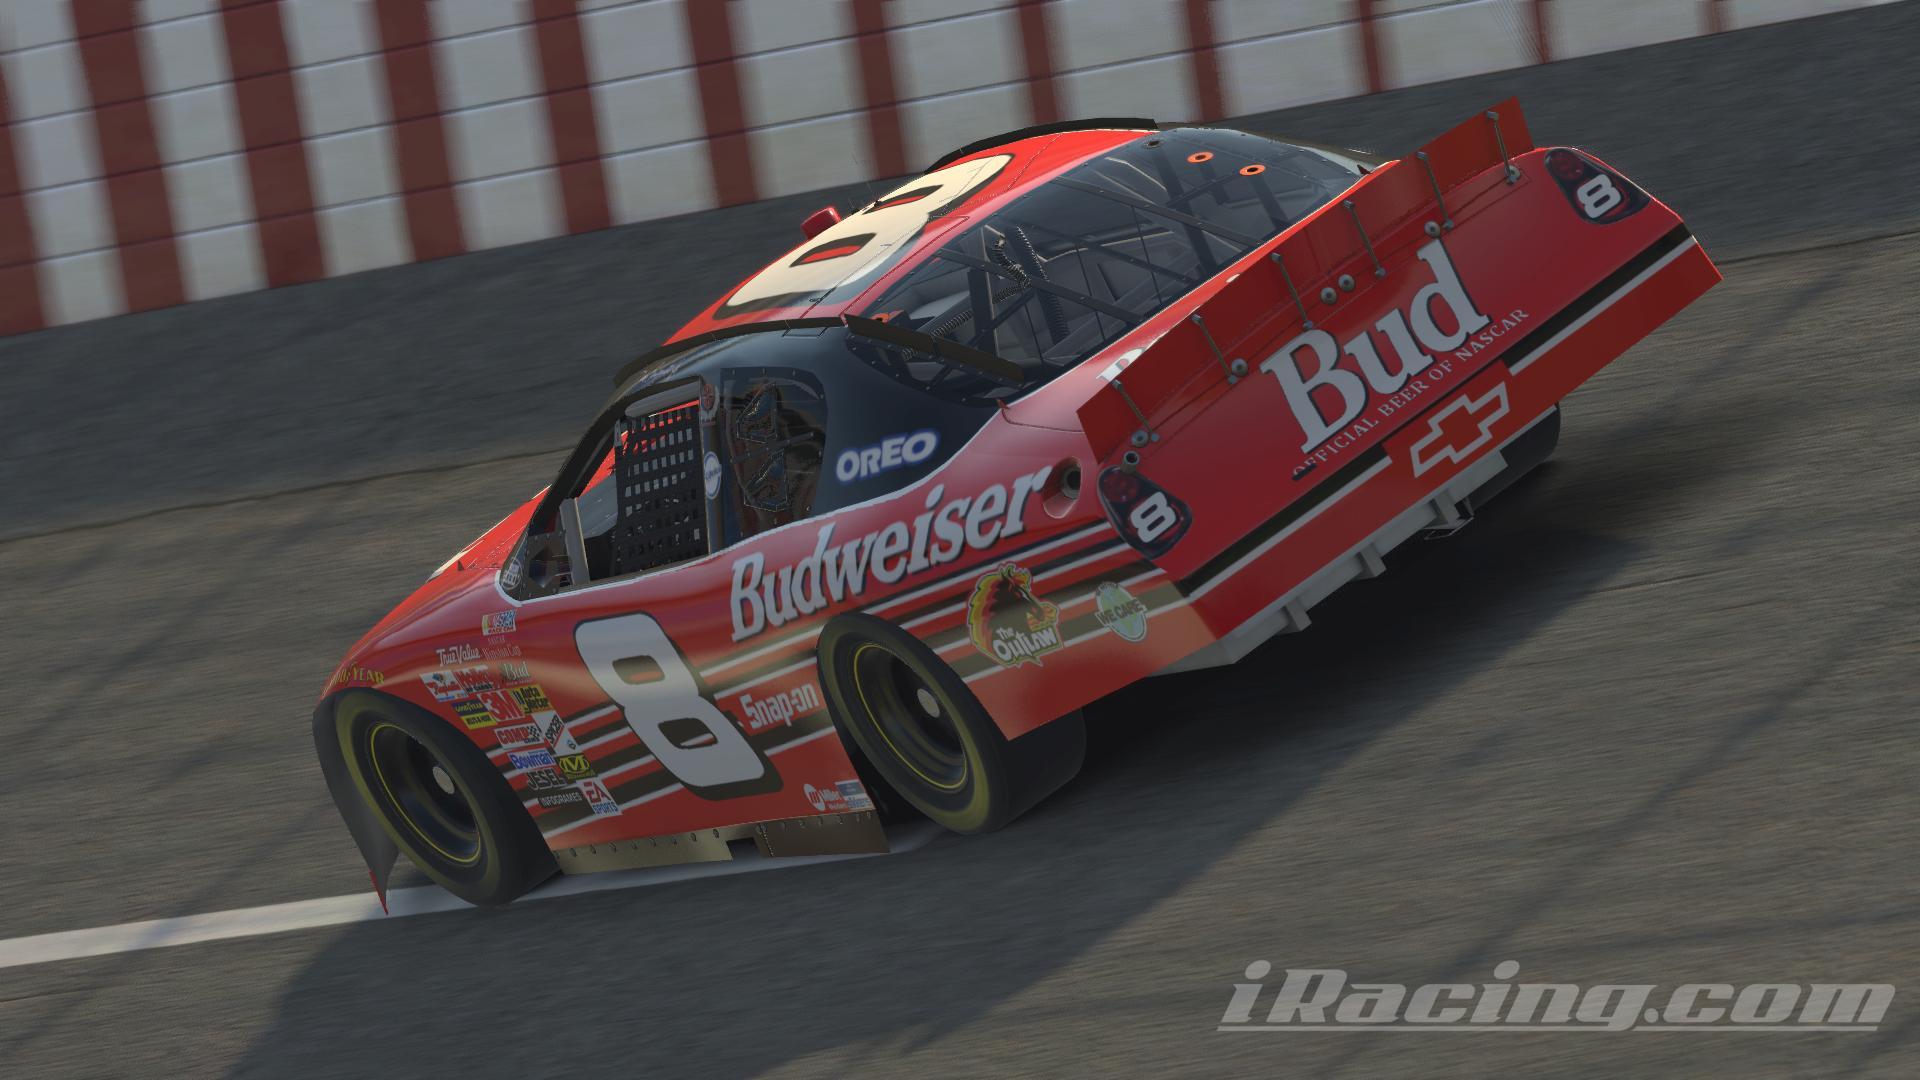 Preview of Budweiser 2000 Dale Jr w/ numbers by Blake Kelley